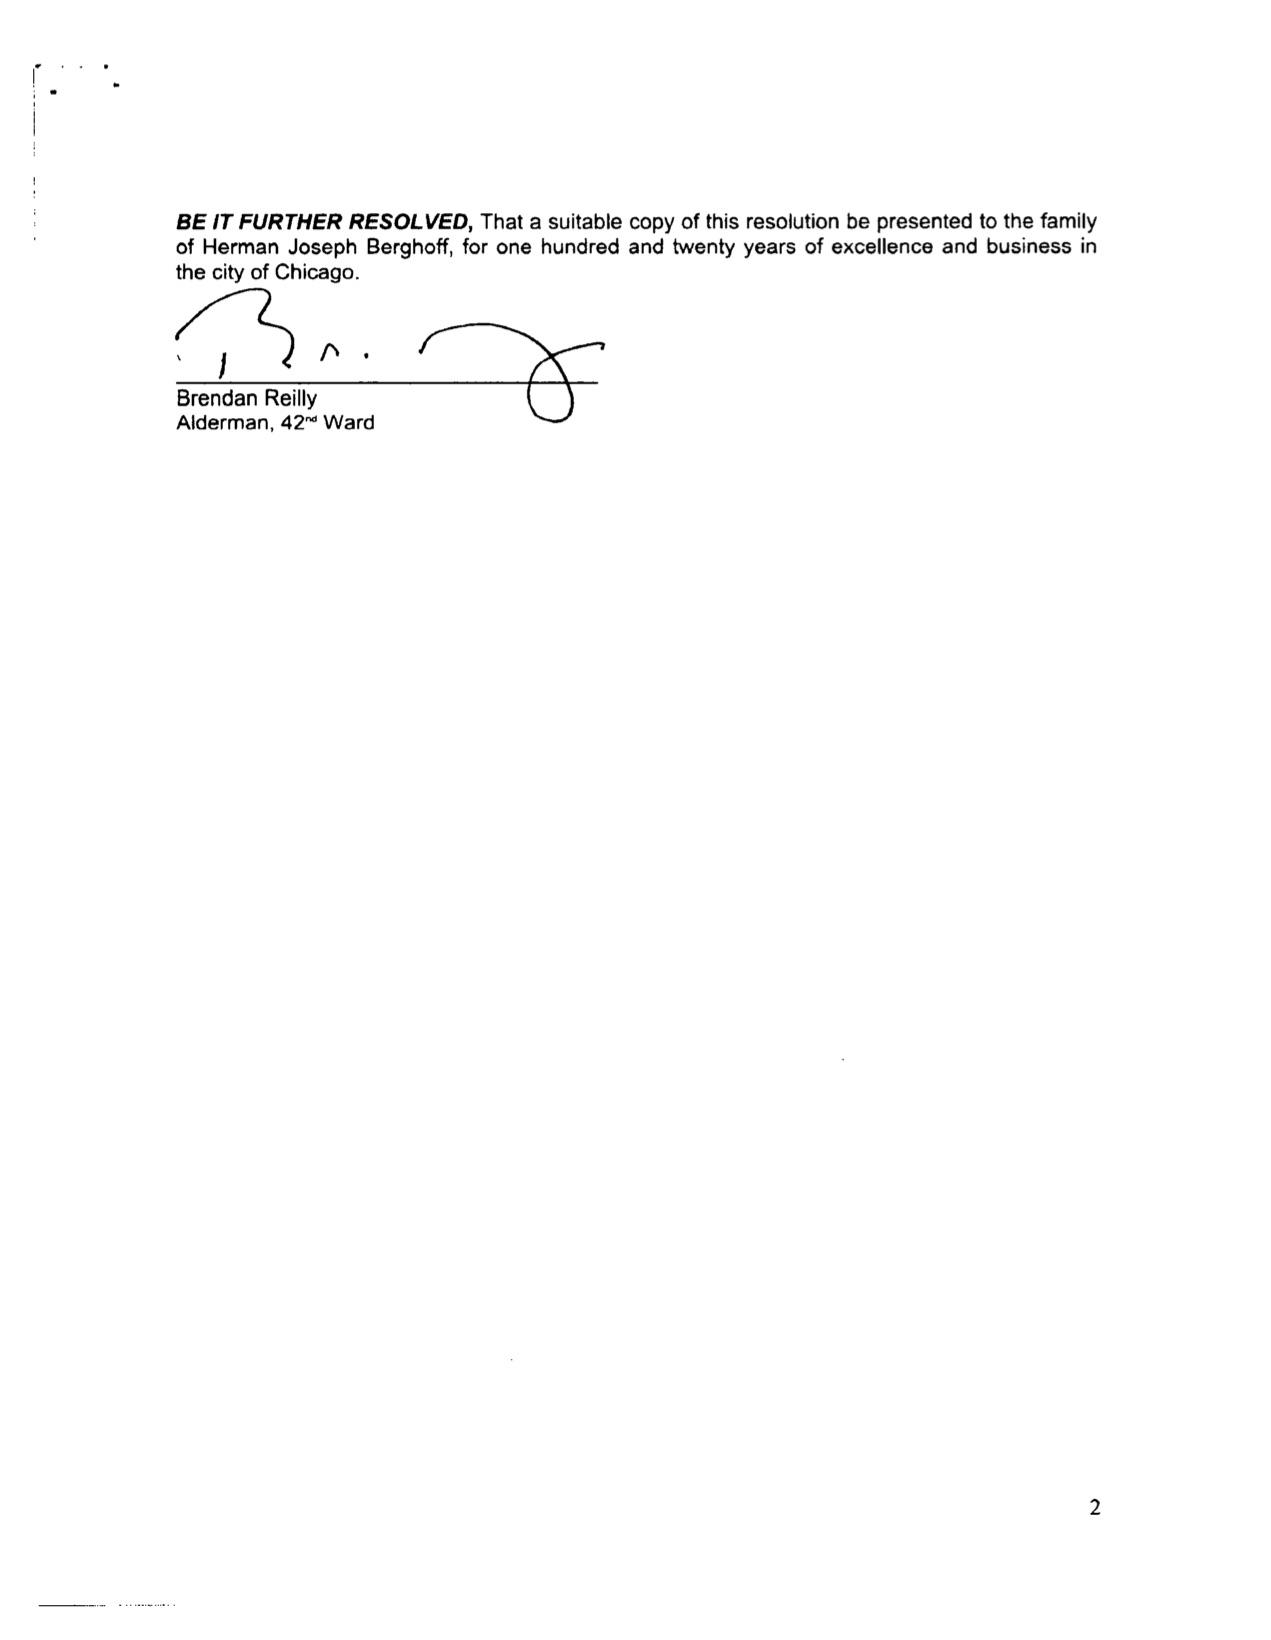 The Berghoff Resolution3.jpg